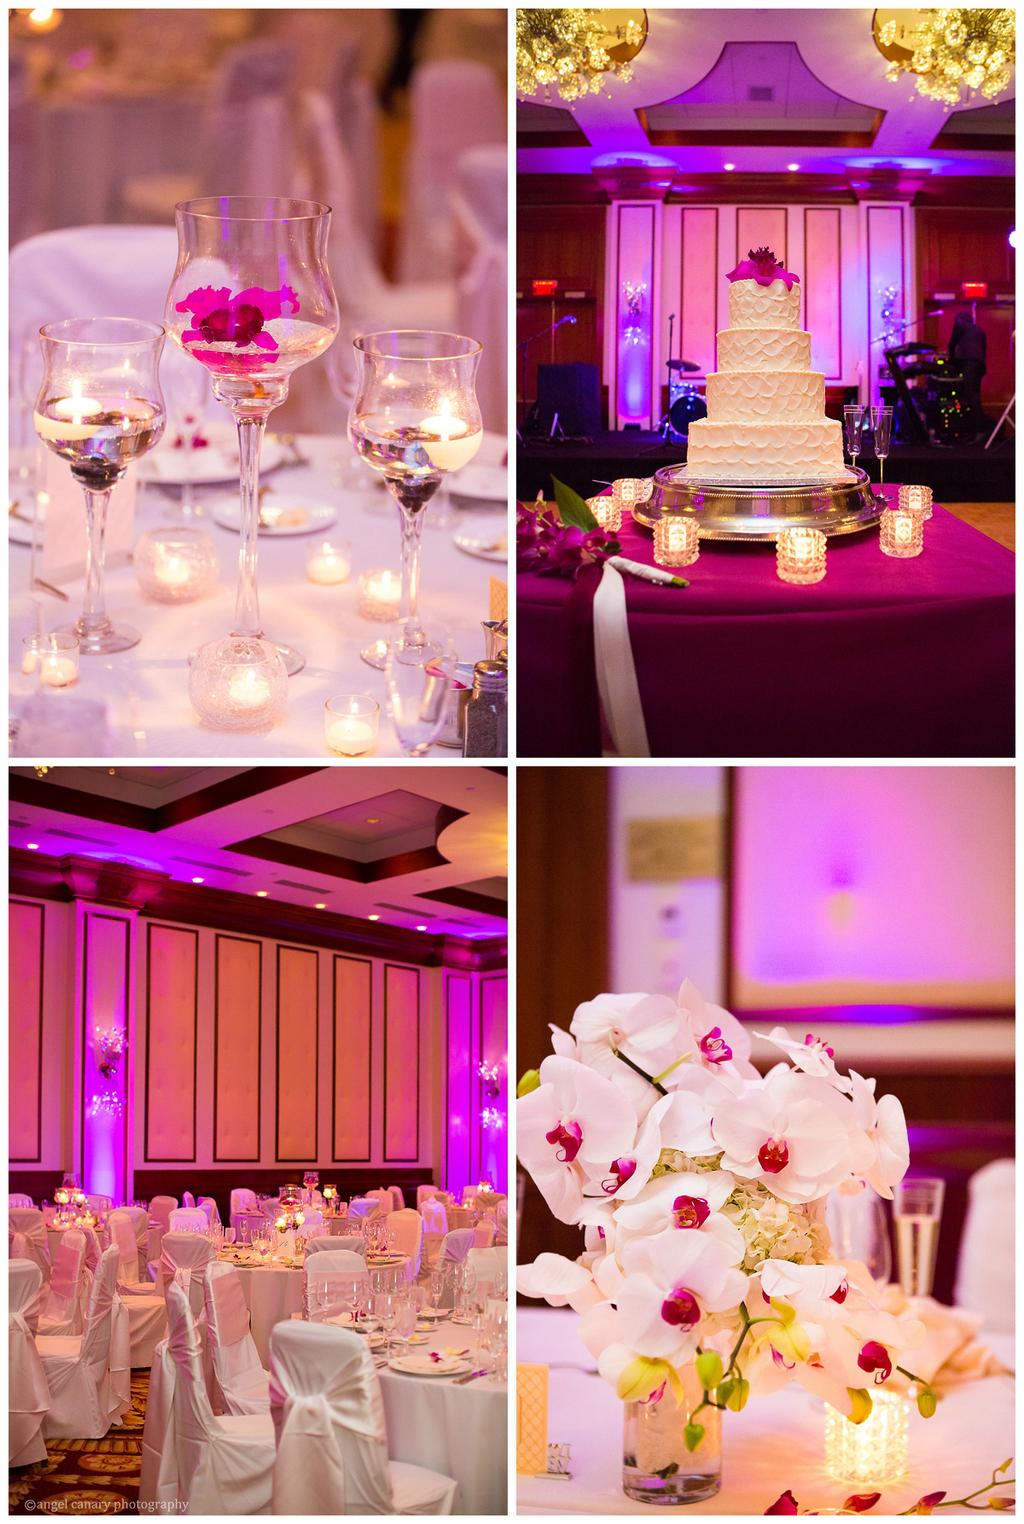 000053indianapolis_wedding_photographer_conrad_hotel.full